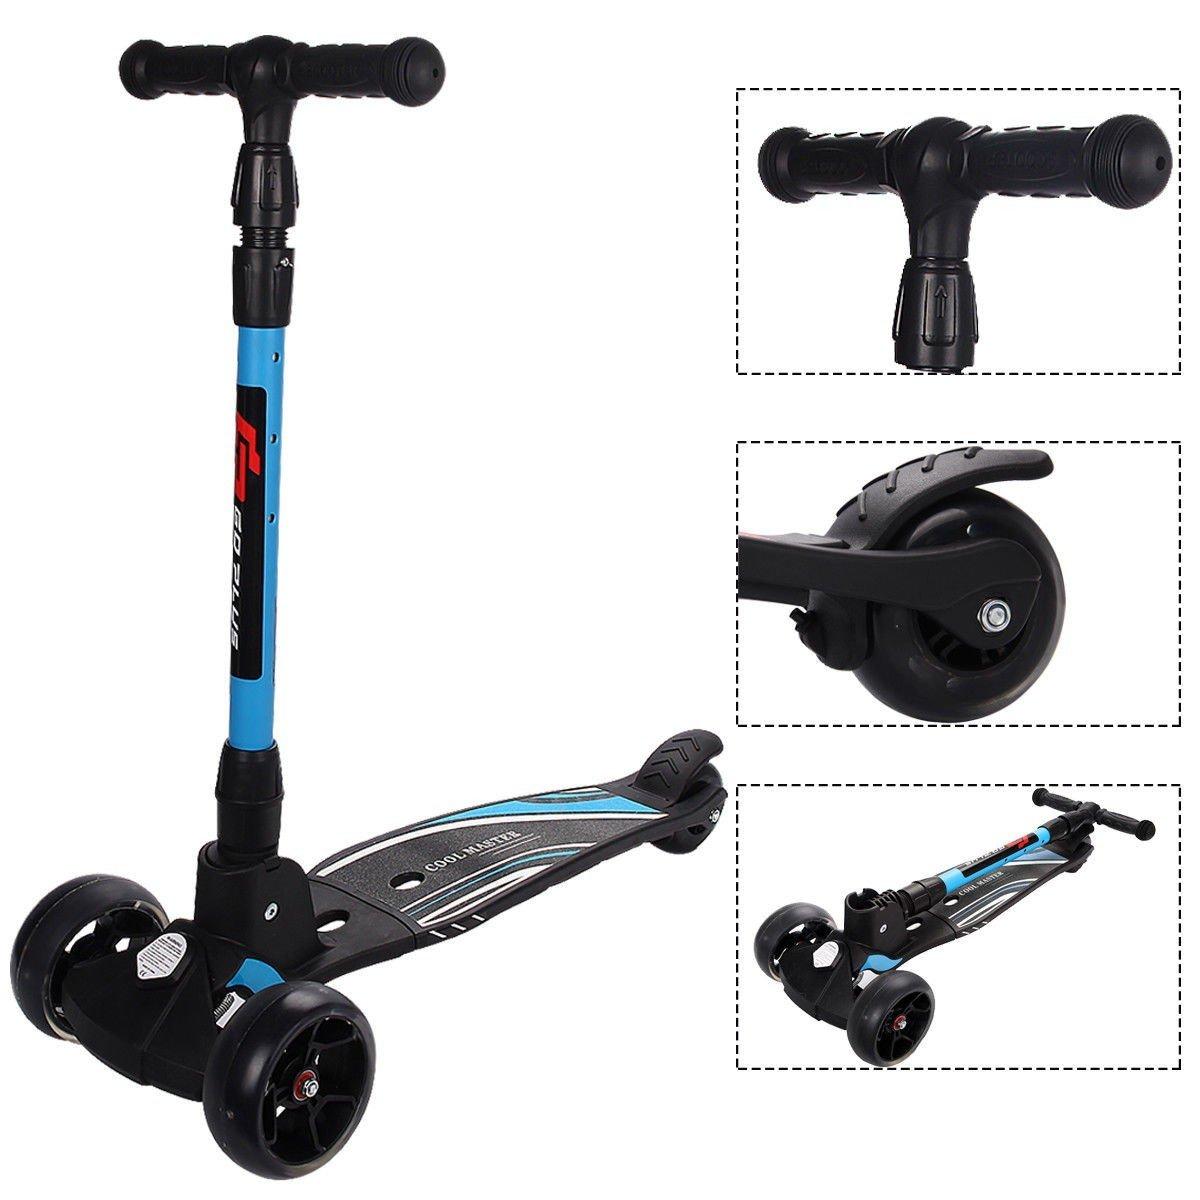 Folding Aluminum Adjustable Height LED 3 Wheels T-Bar Kick Scooter - Blue